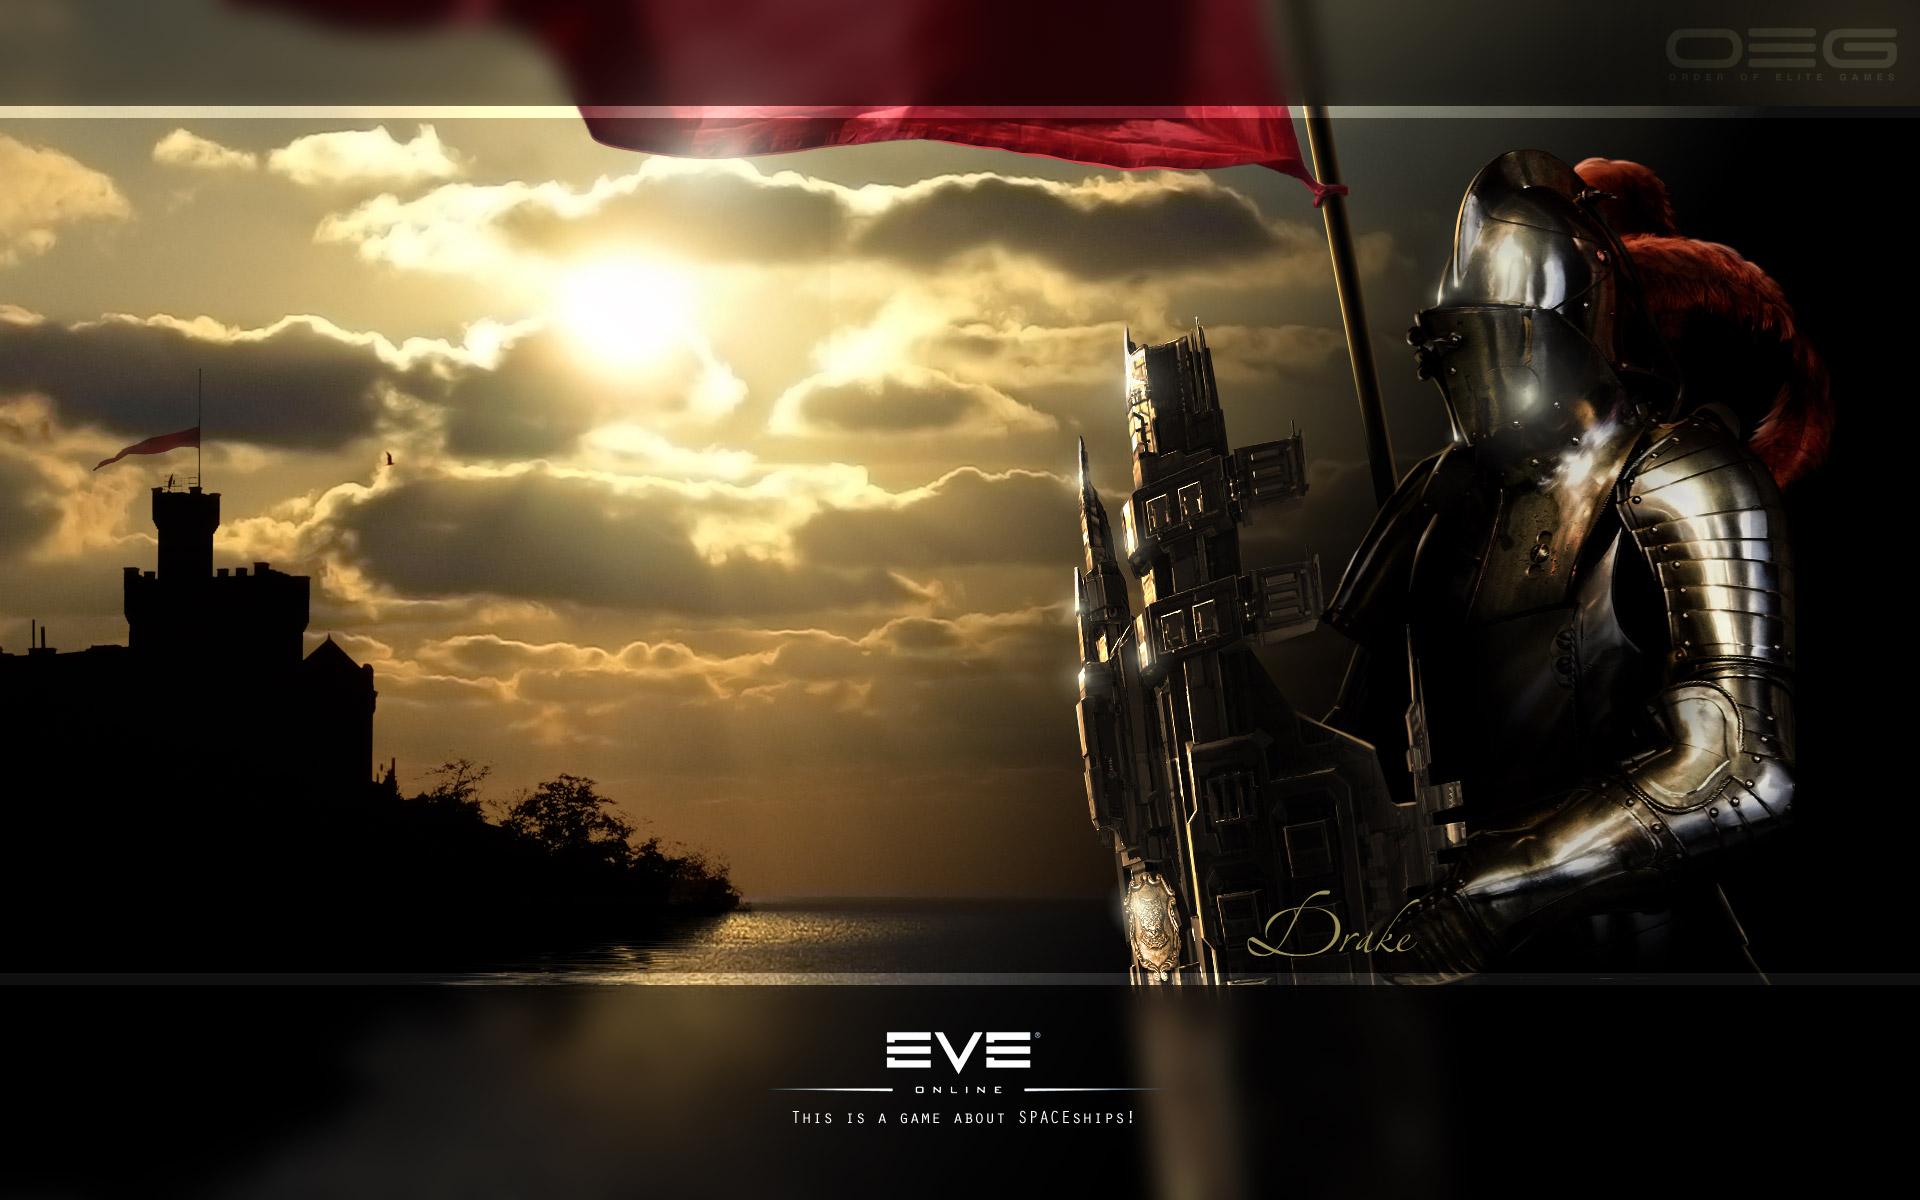 177 EVE Online HD Wallpapers